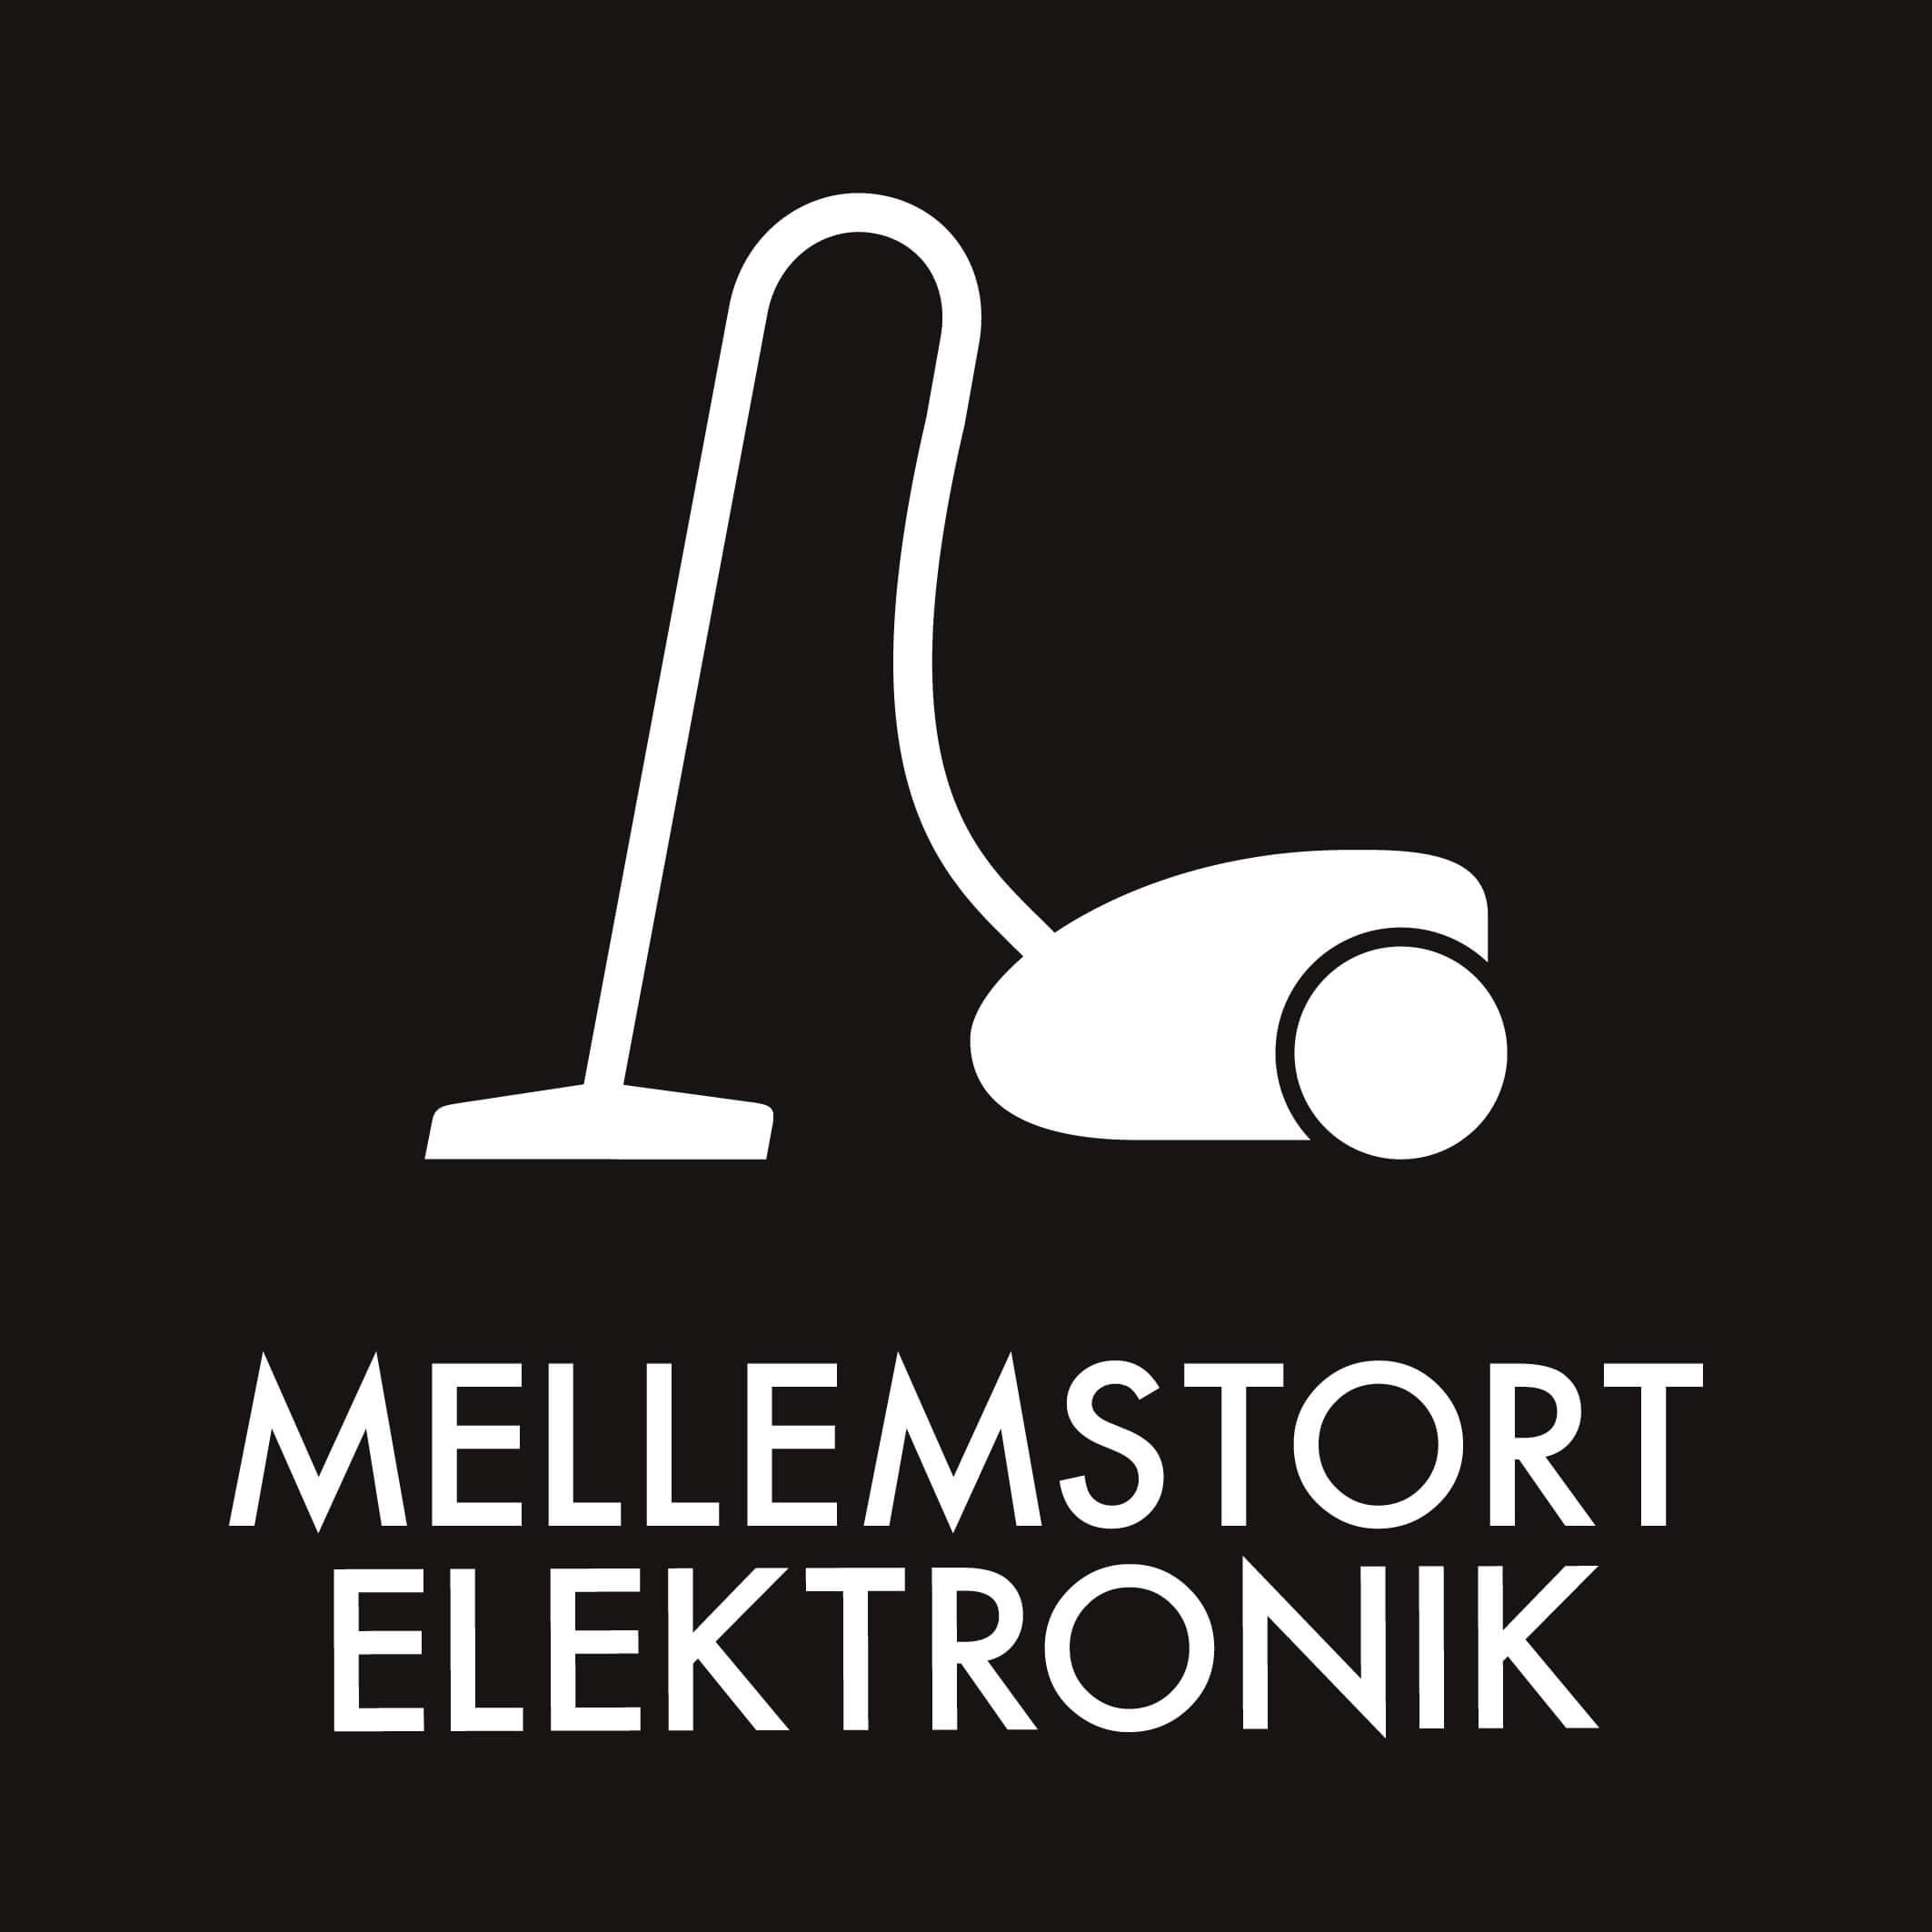 Dansk Affaldssortering - Mellemstort elektronik sort